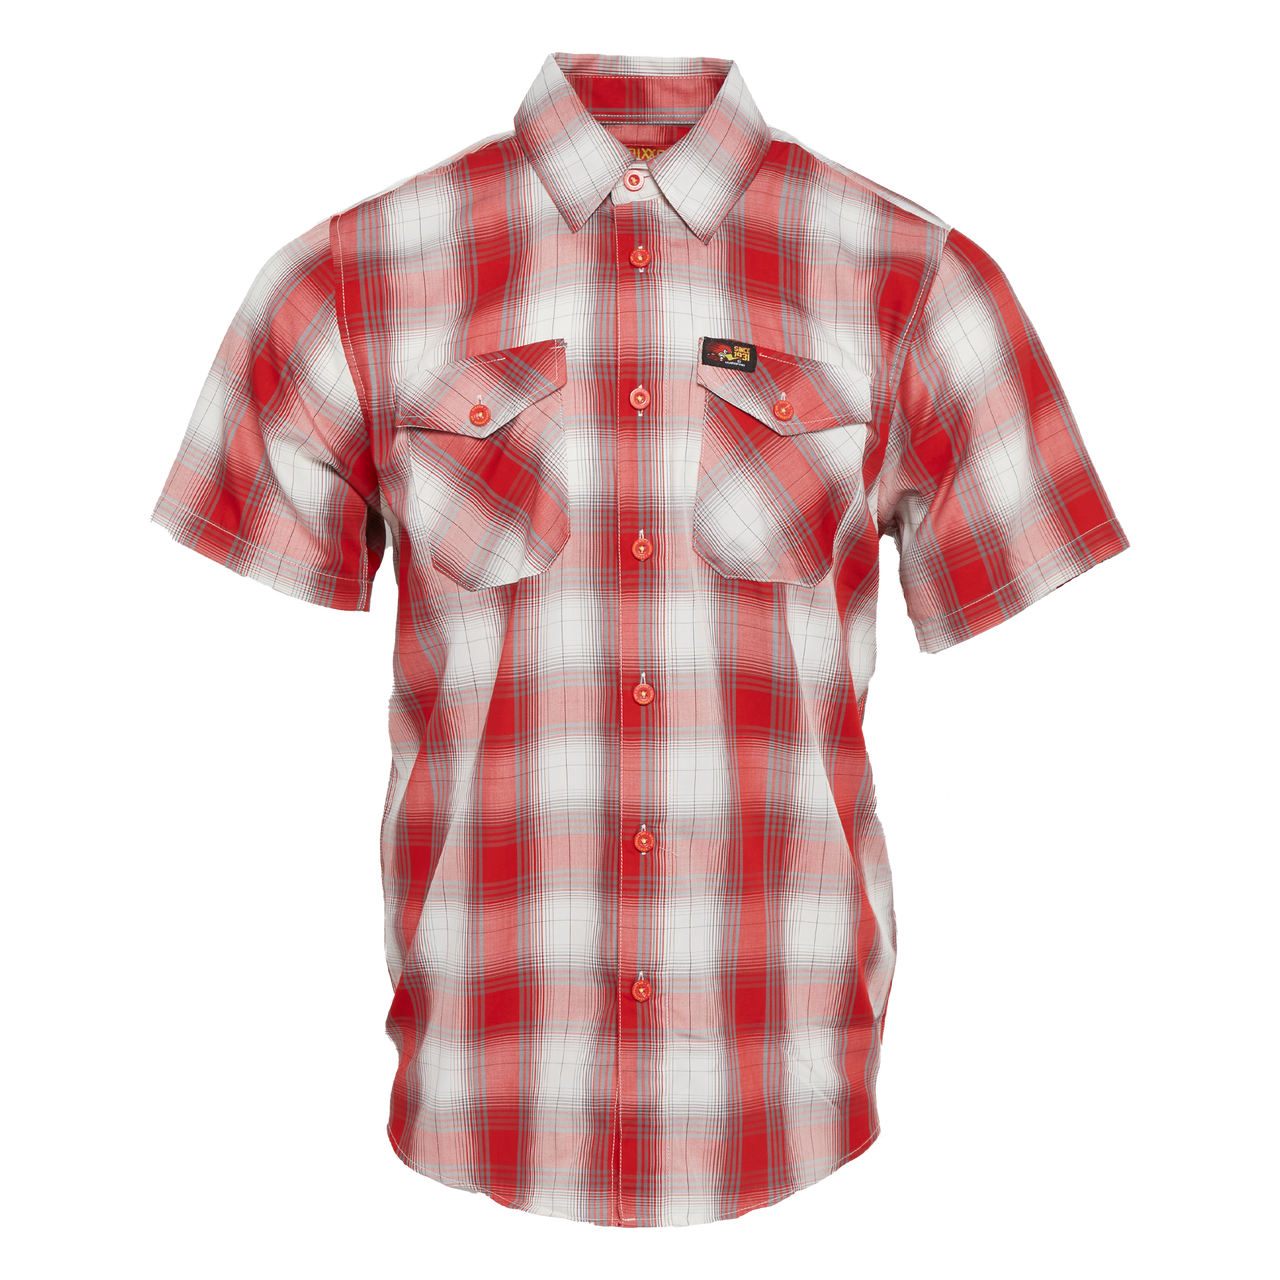 DIXXON / Clay Smith Cams 90th Anniversary Bamboo Shirt